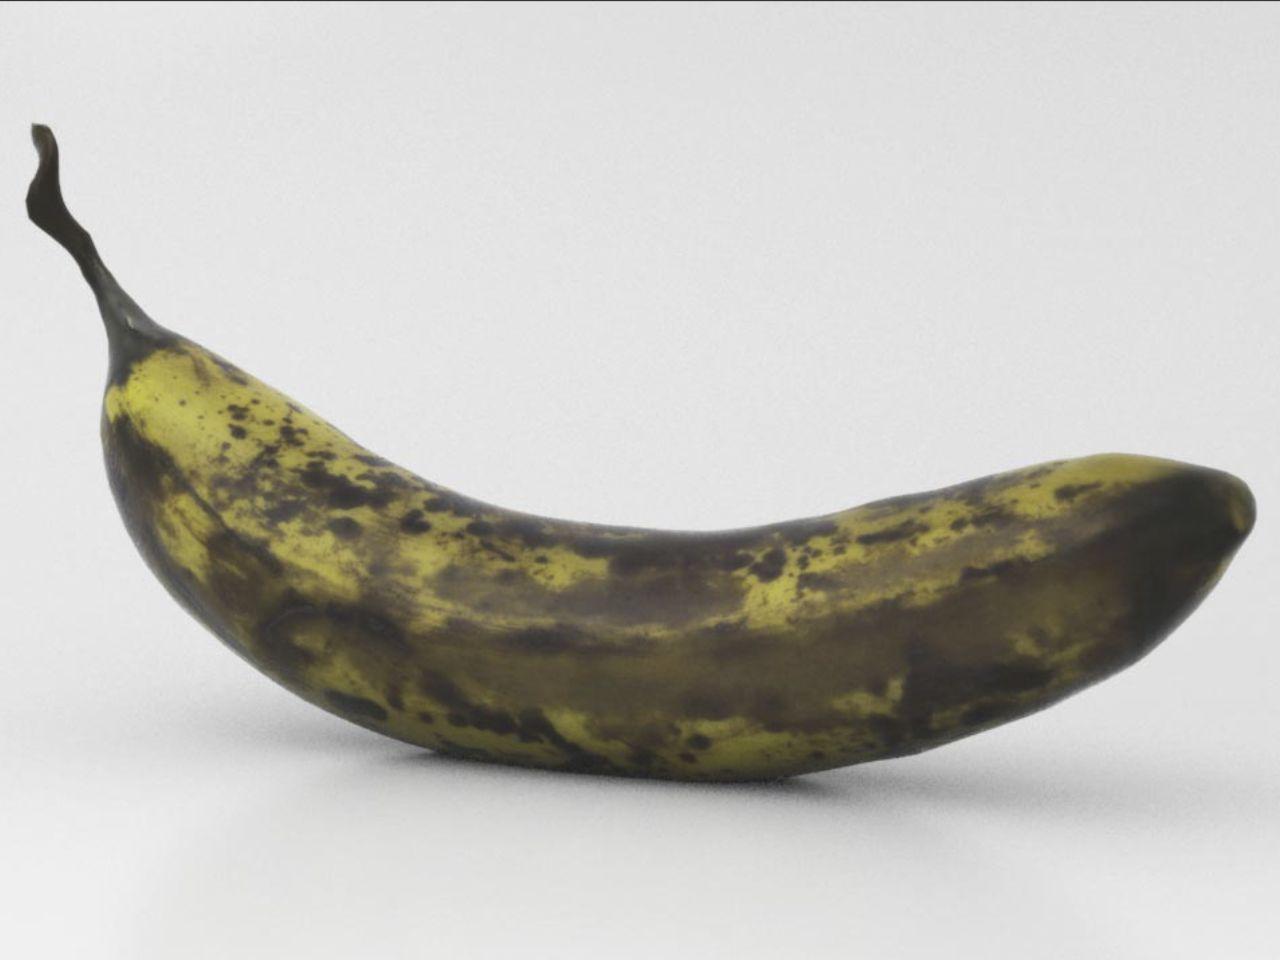 TALOS 3D Scan Store Food Banana Ripe Model